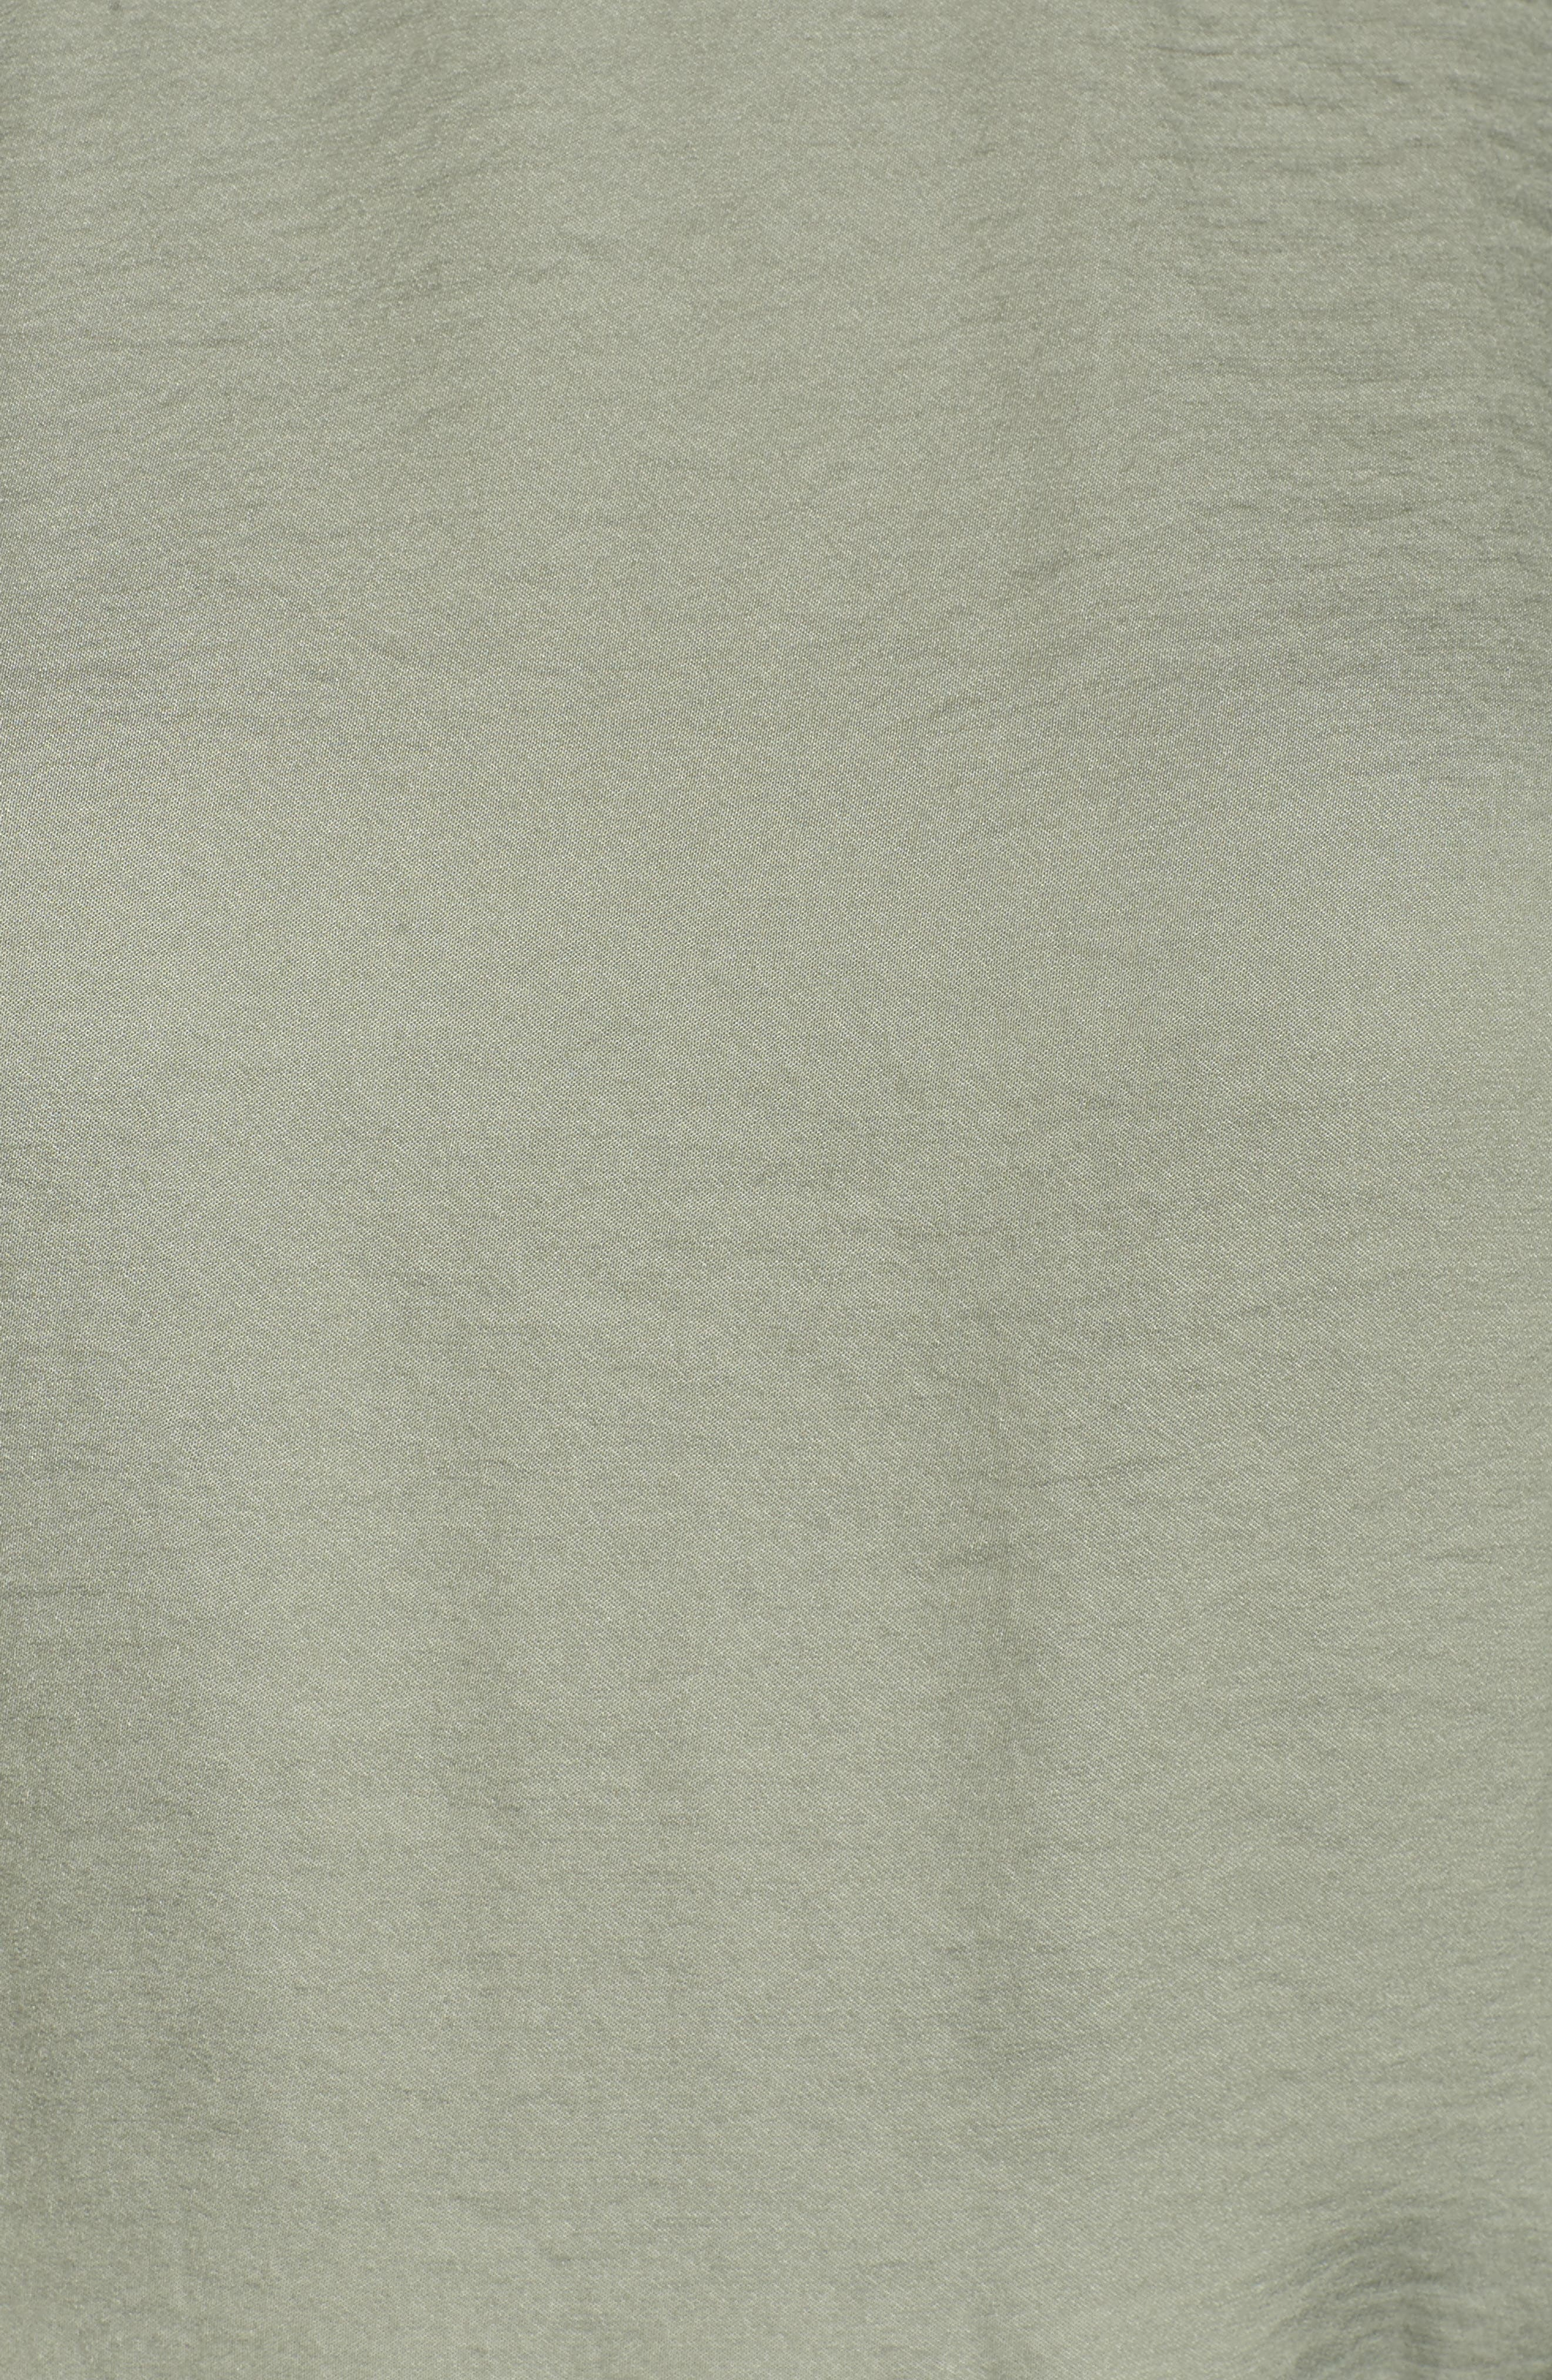 Cold Shoulder Rumpled Satin Dress,                             Alternate thumbnail 6, color,                             304